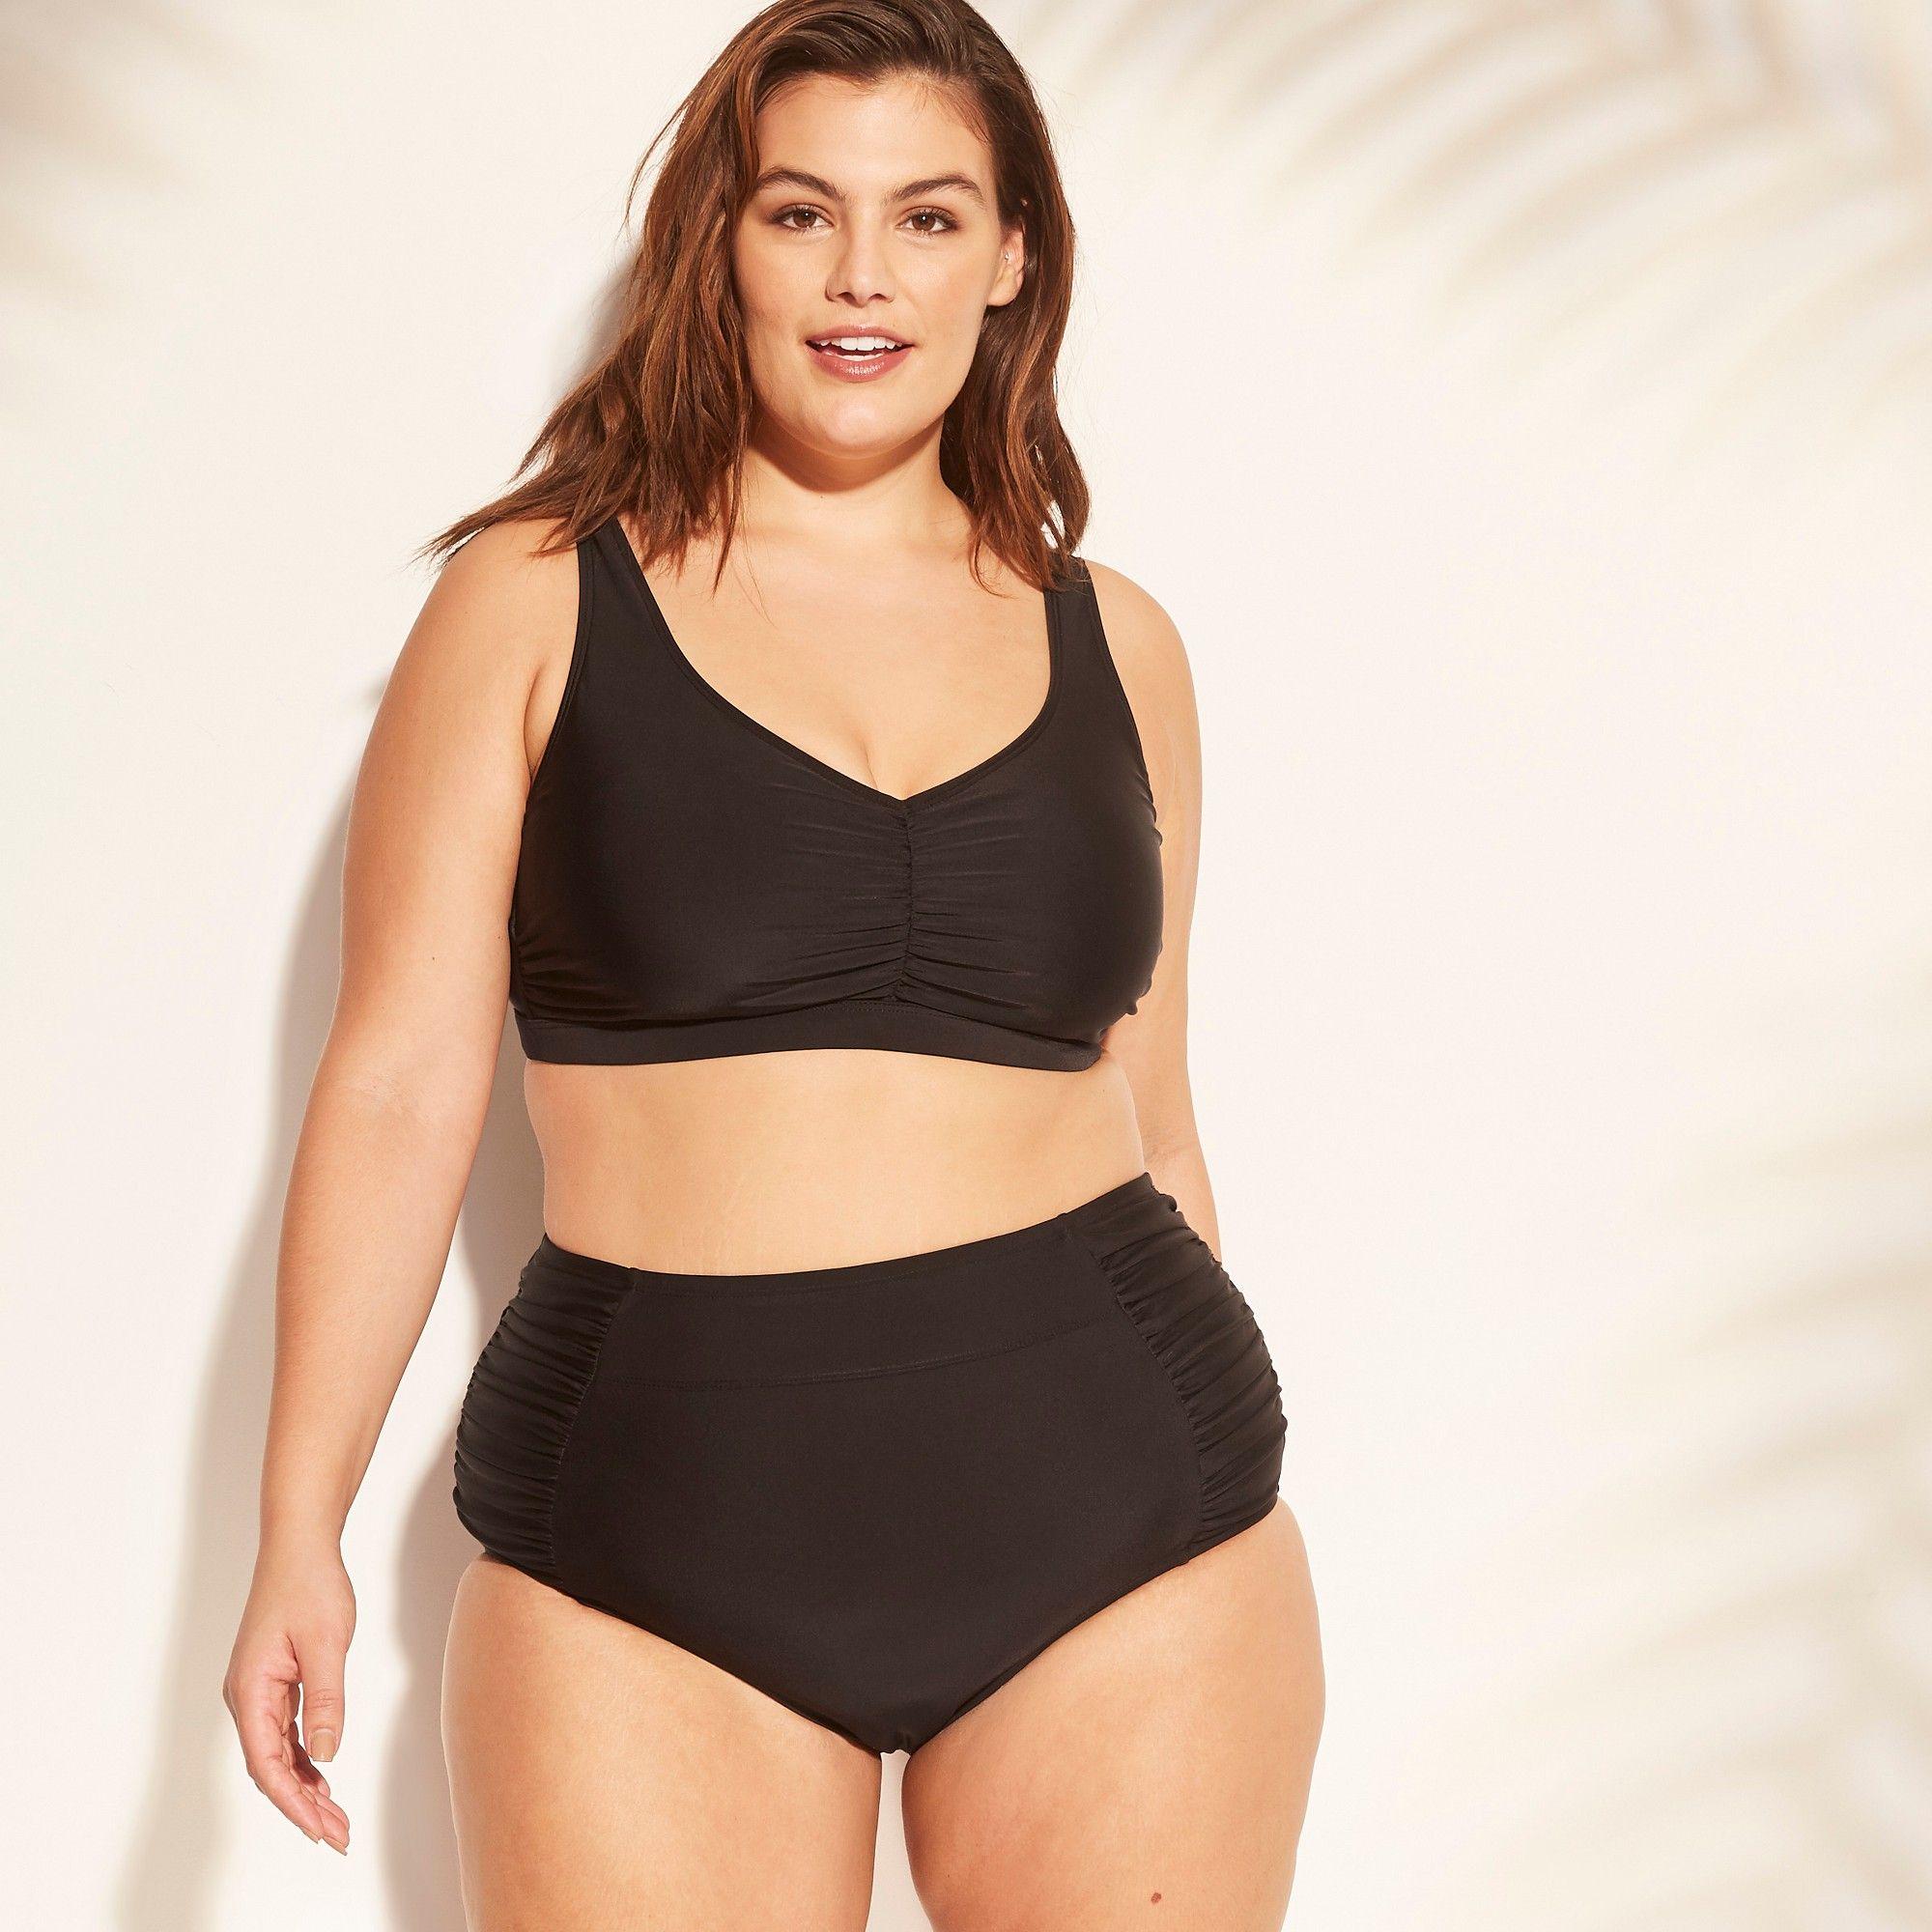 eb34339448 Women s Plus Size Twist Back Bikini Top - Kona Sol Black 18W ...